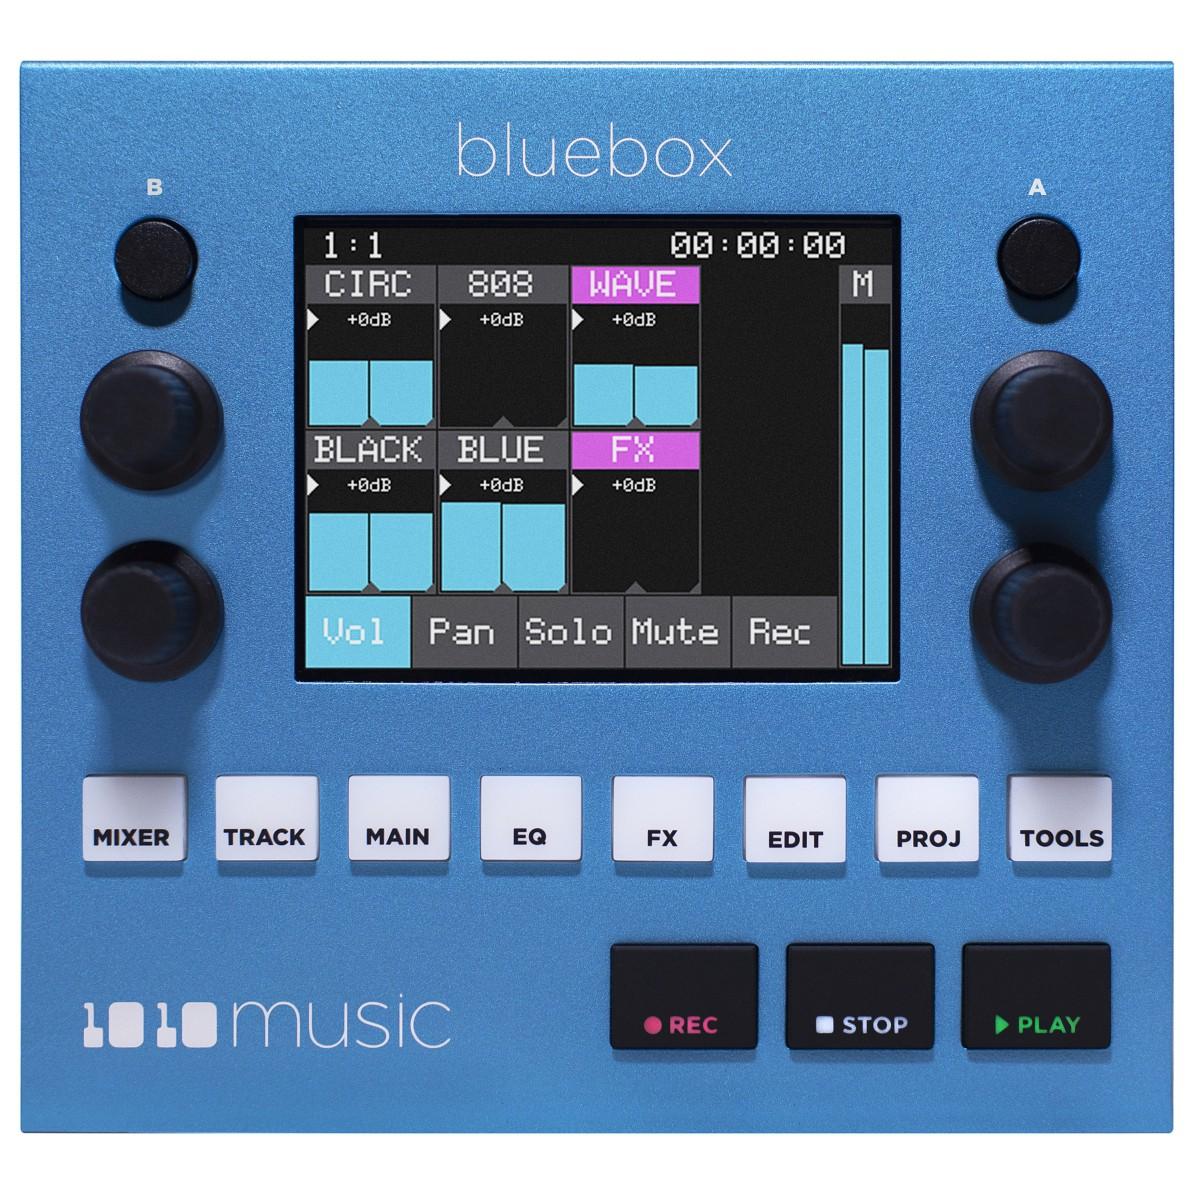 1010Music Bluebox Compact Digital Mixer   Recorder